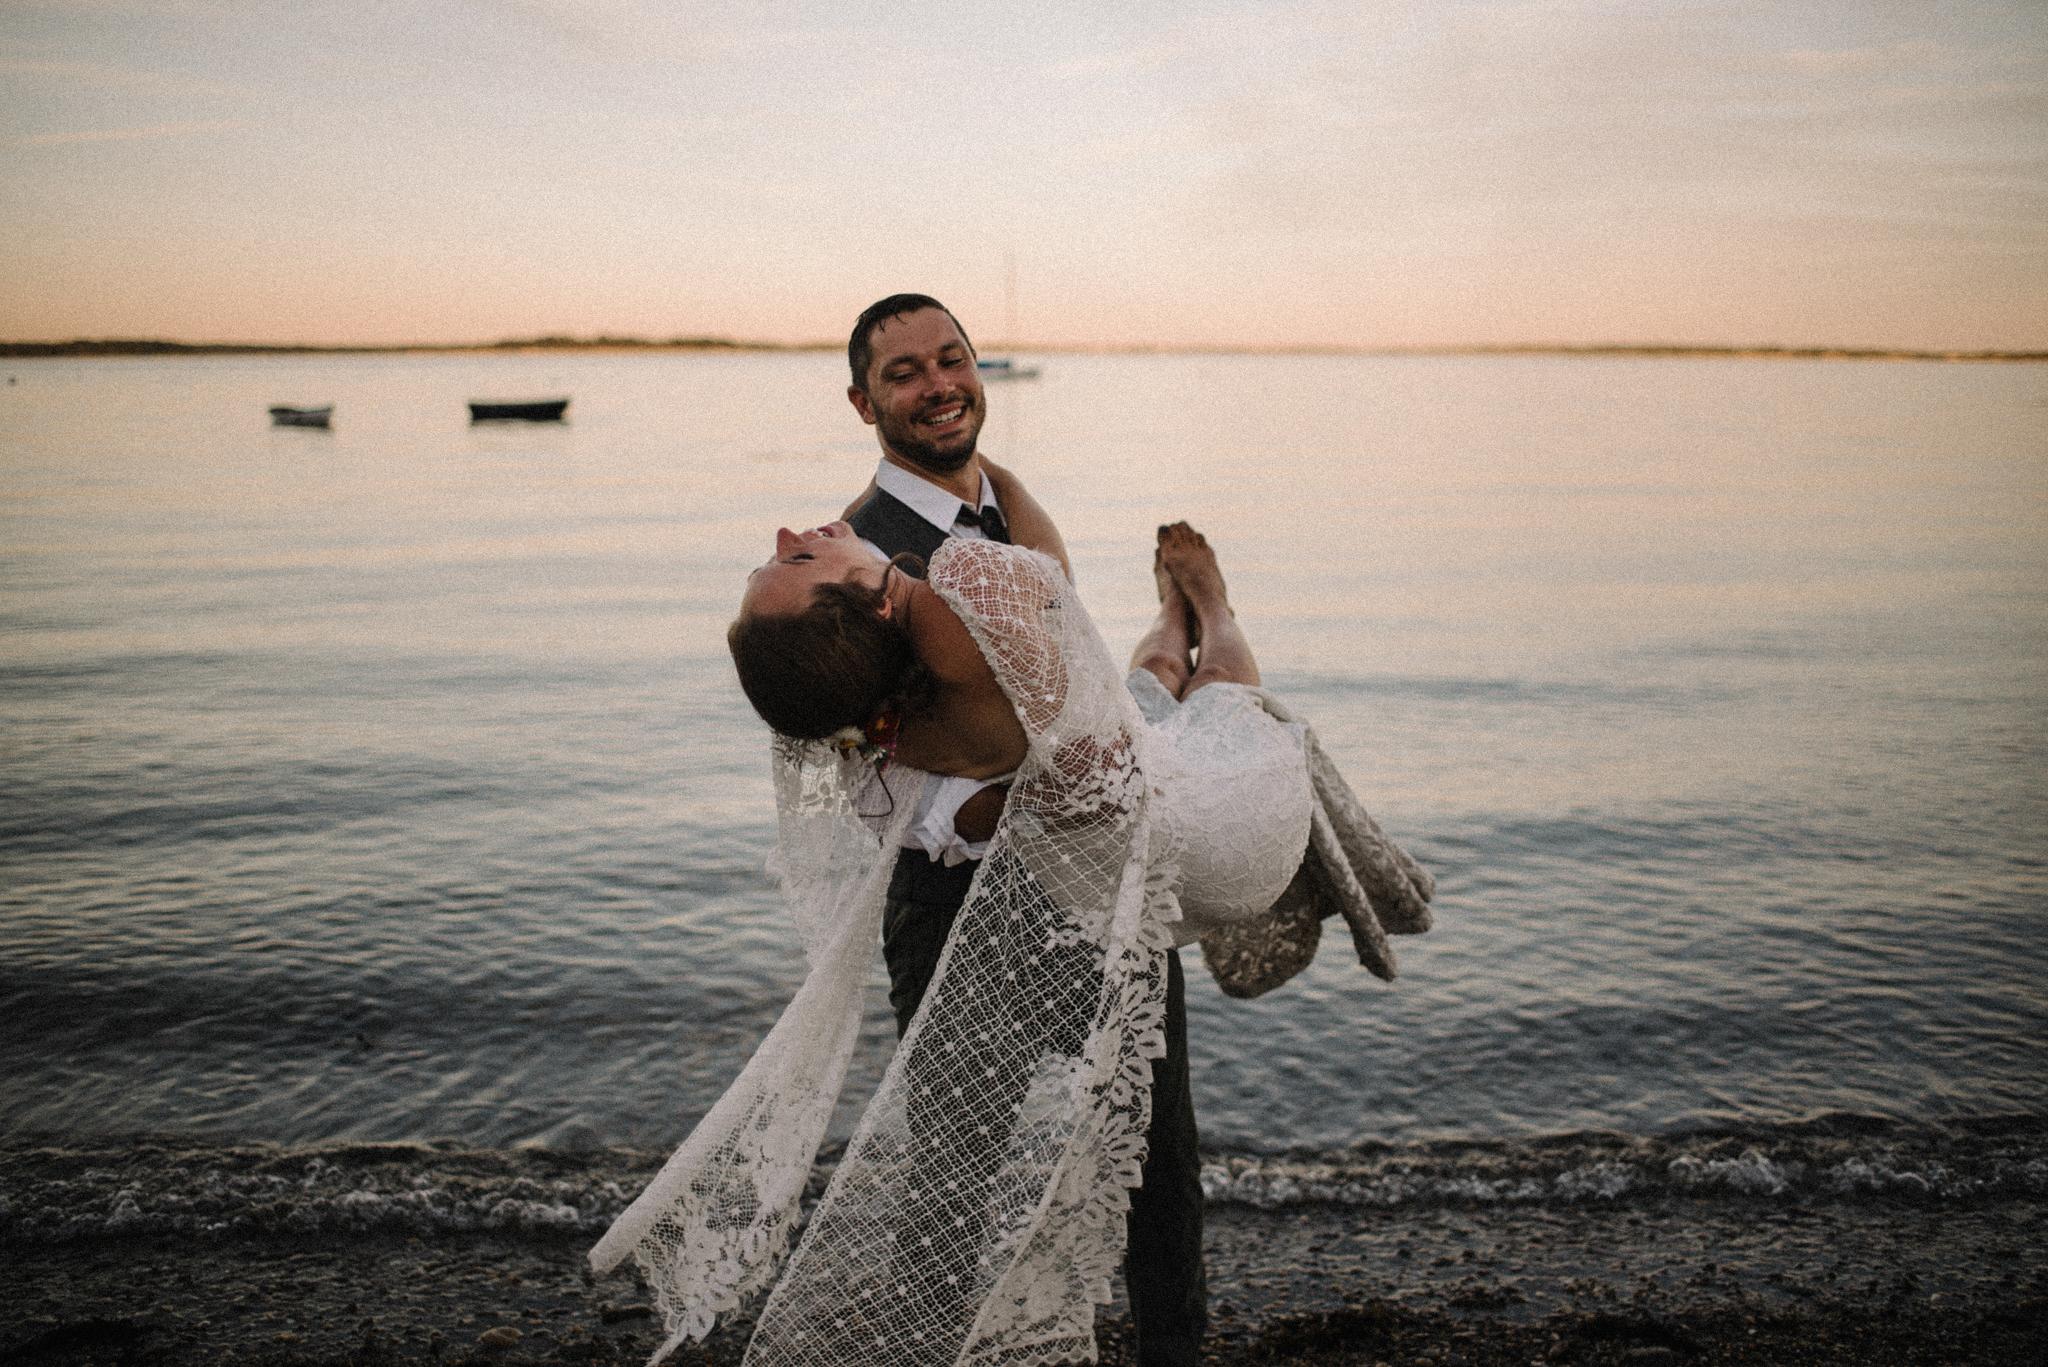 Damian and Jesse Chebeague Island Maine Backyard Destination Beach Wedding White Sails Creative_25.JPG